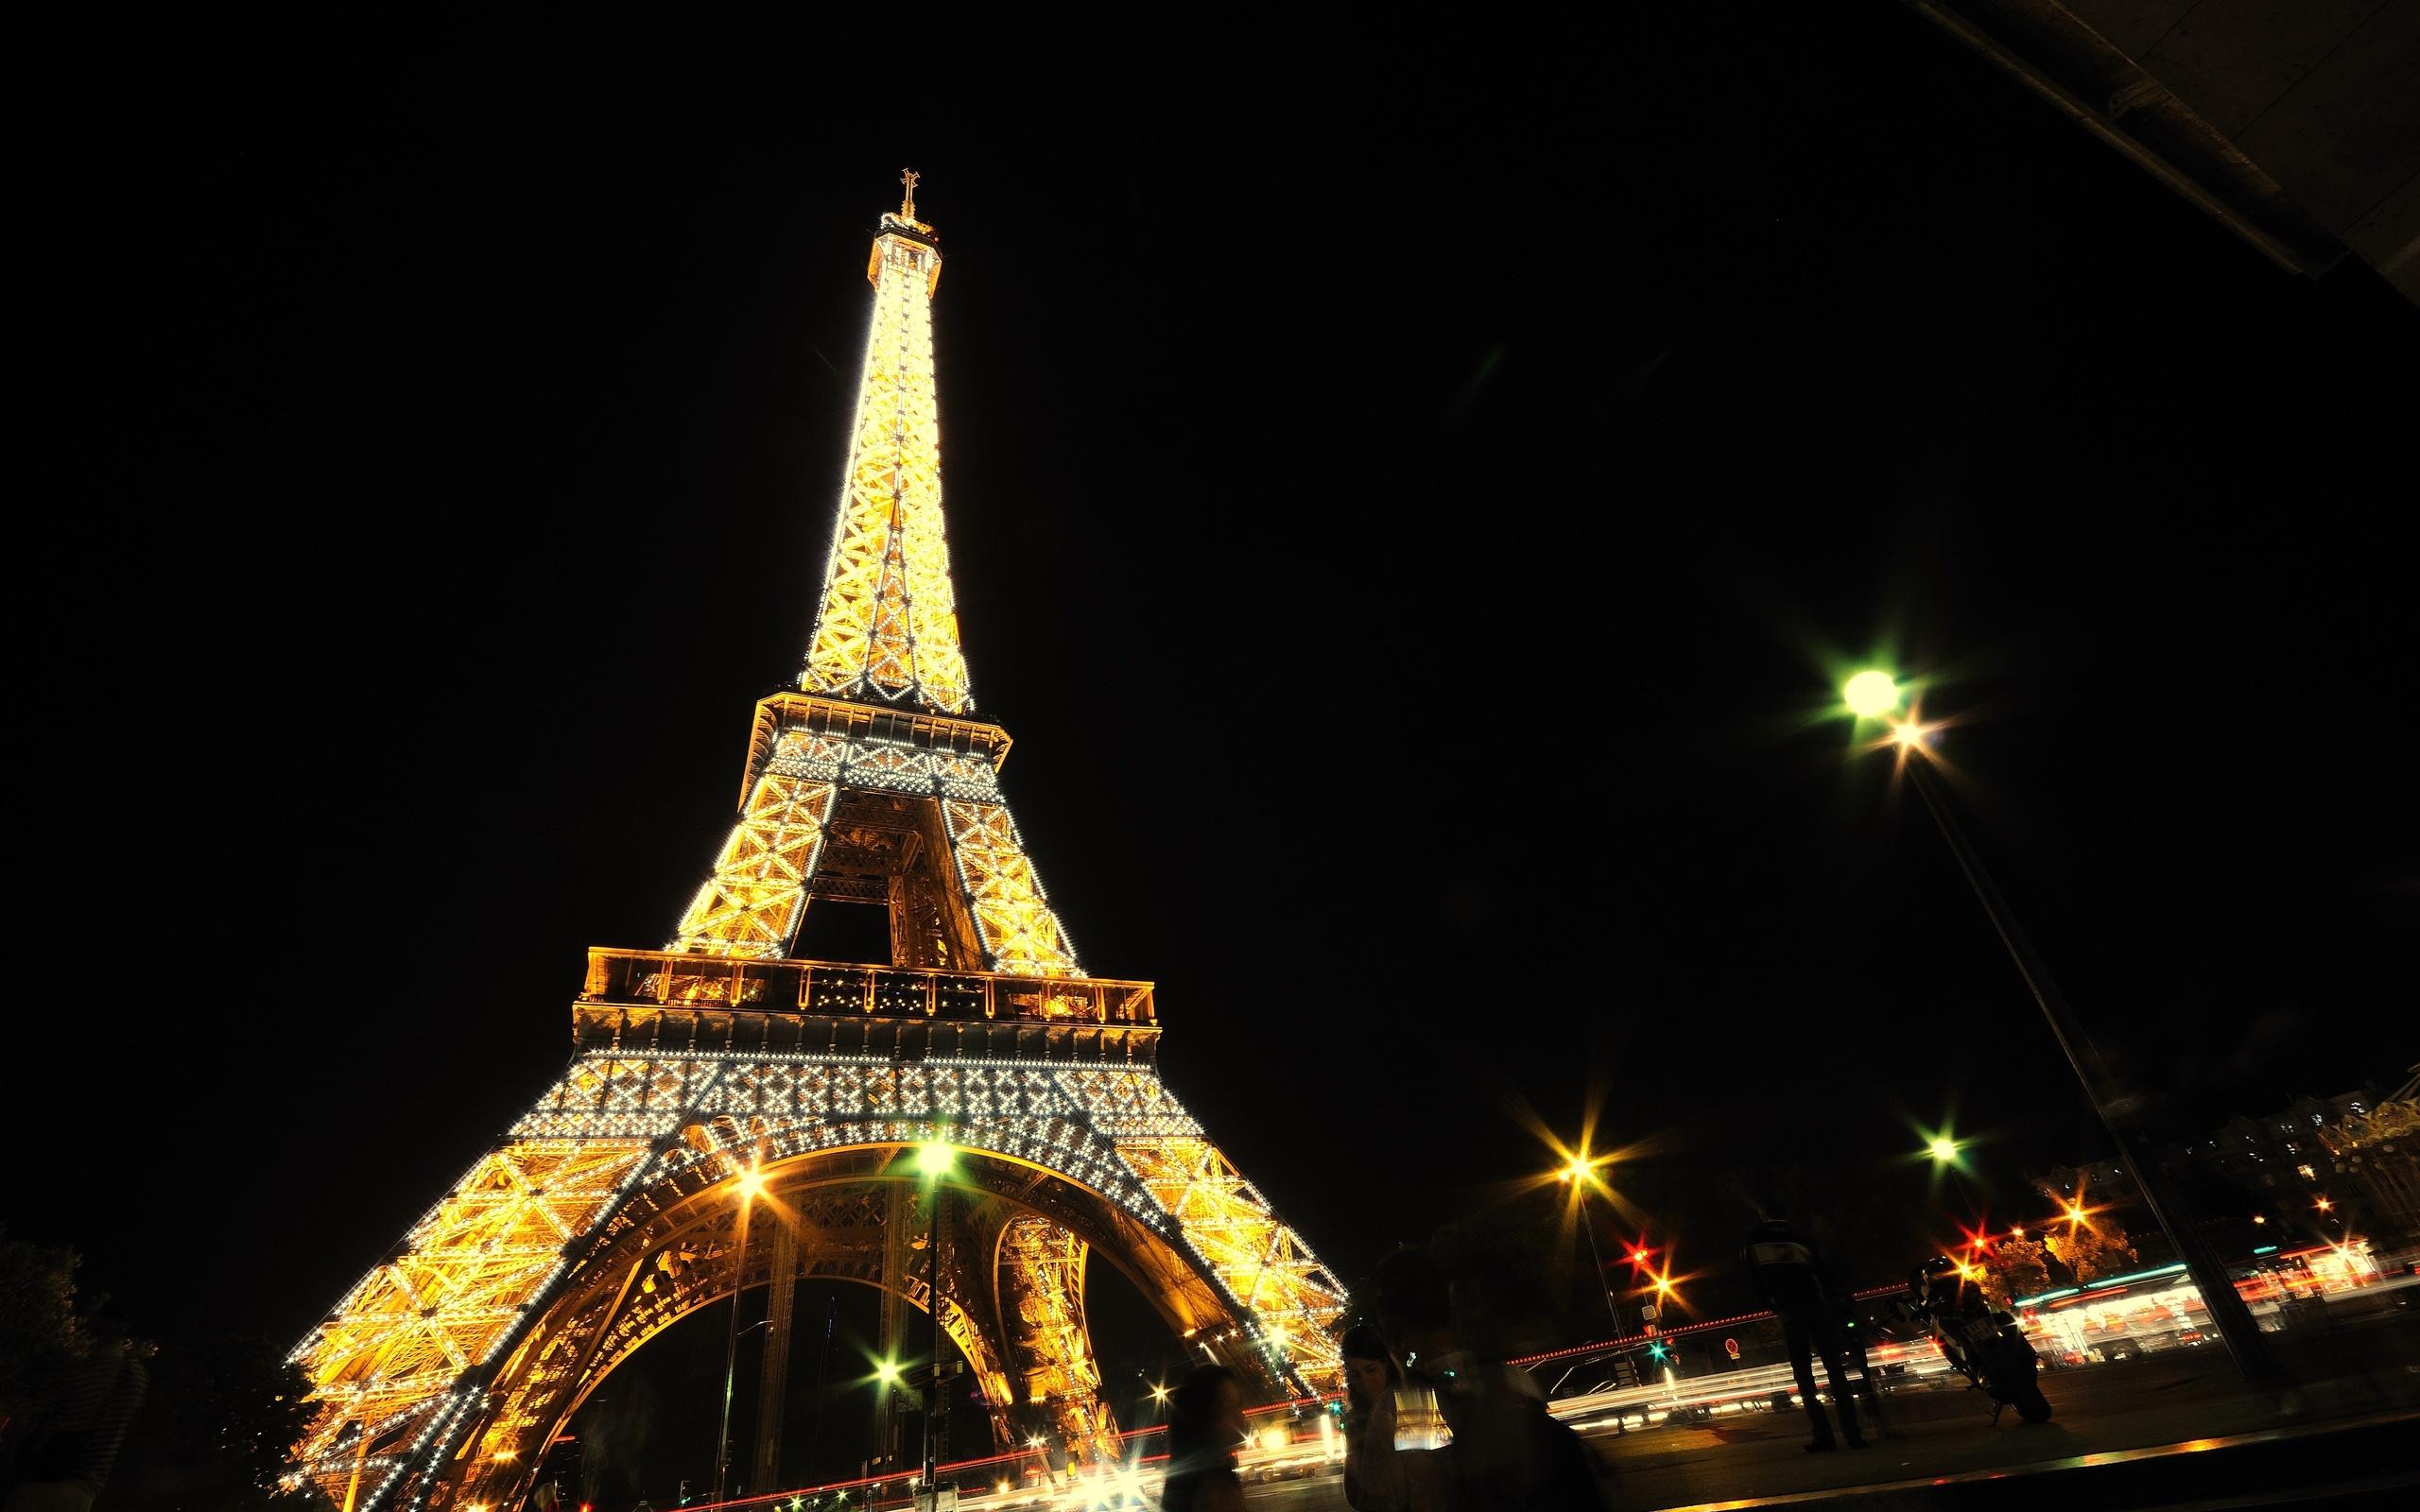 Eiffel Tower At Night Wallpaper Tumblr Wallpapers